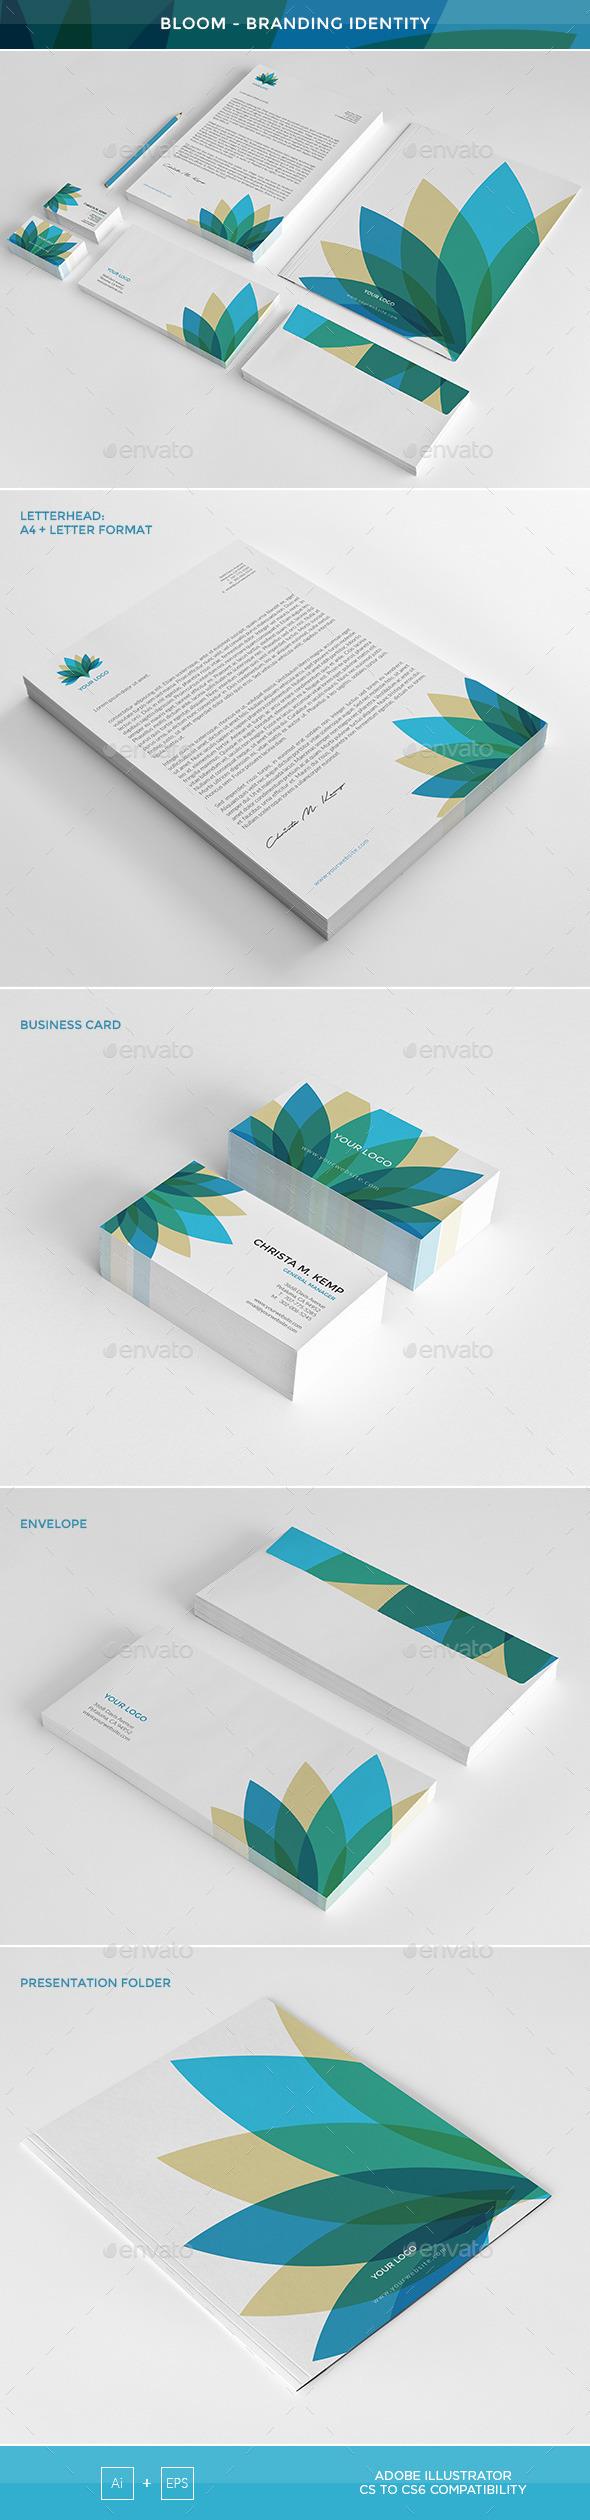 Bloom - Branding Identity - Stationery Print Templates